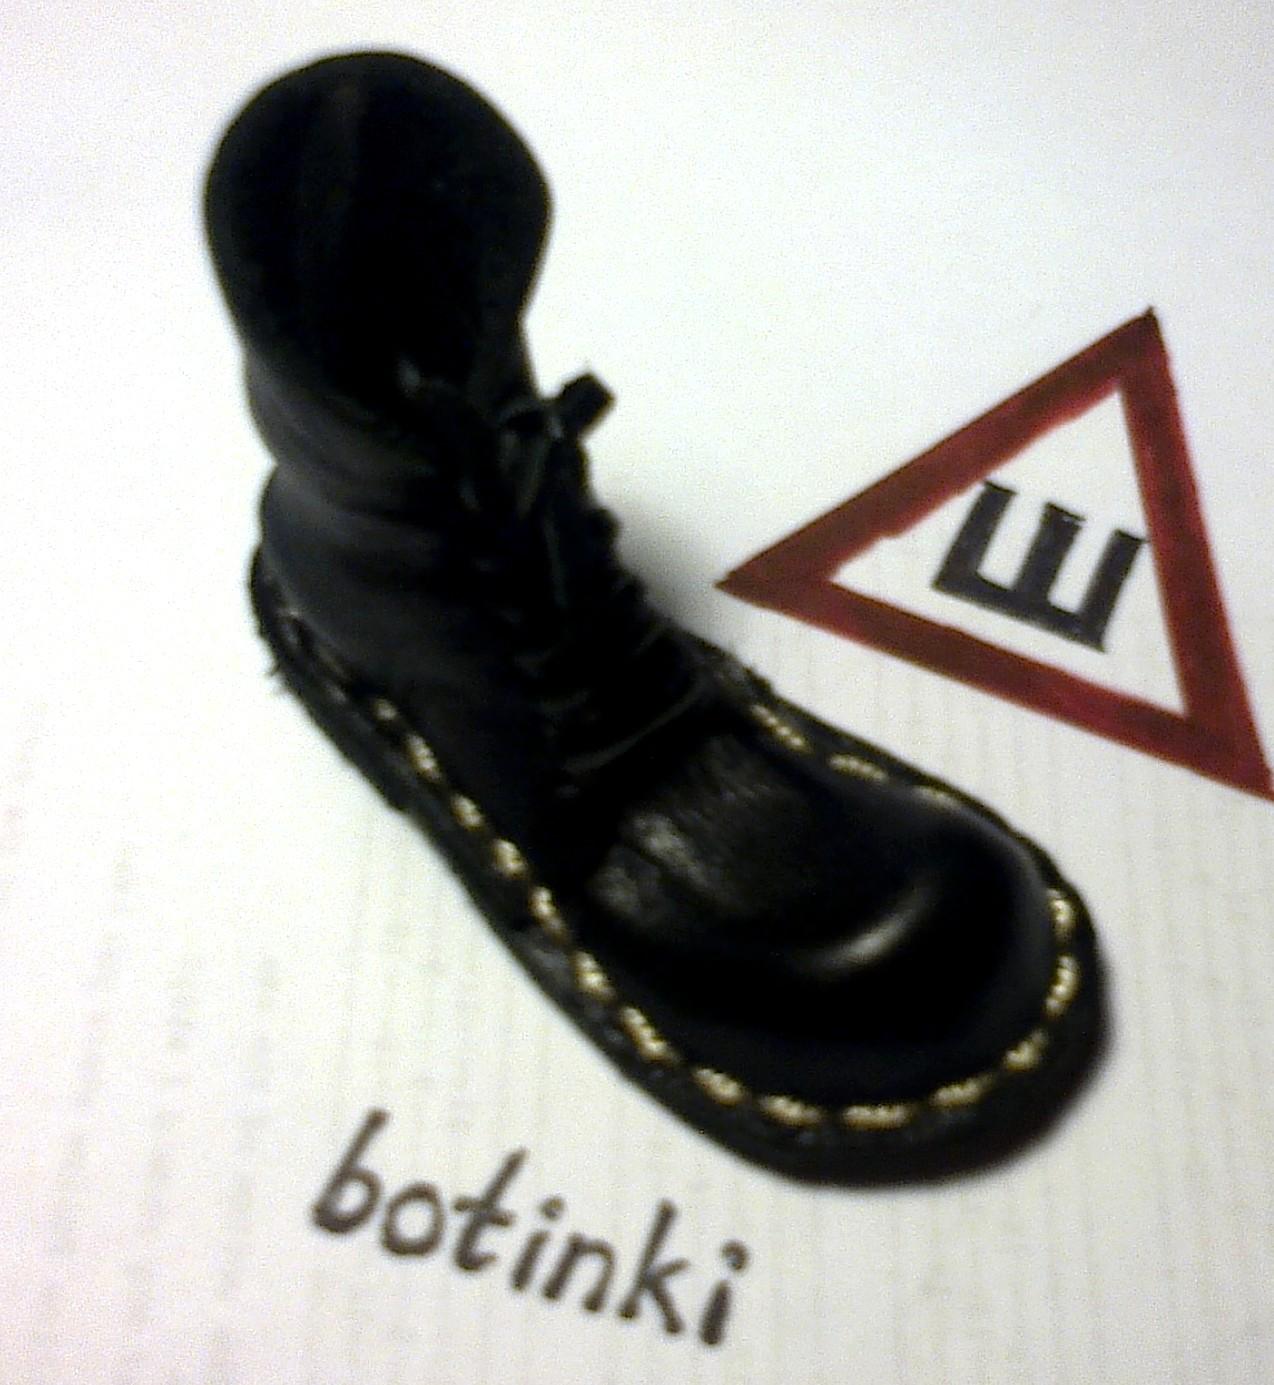 btnk7